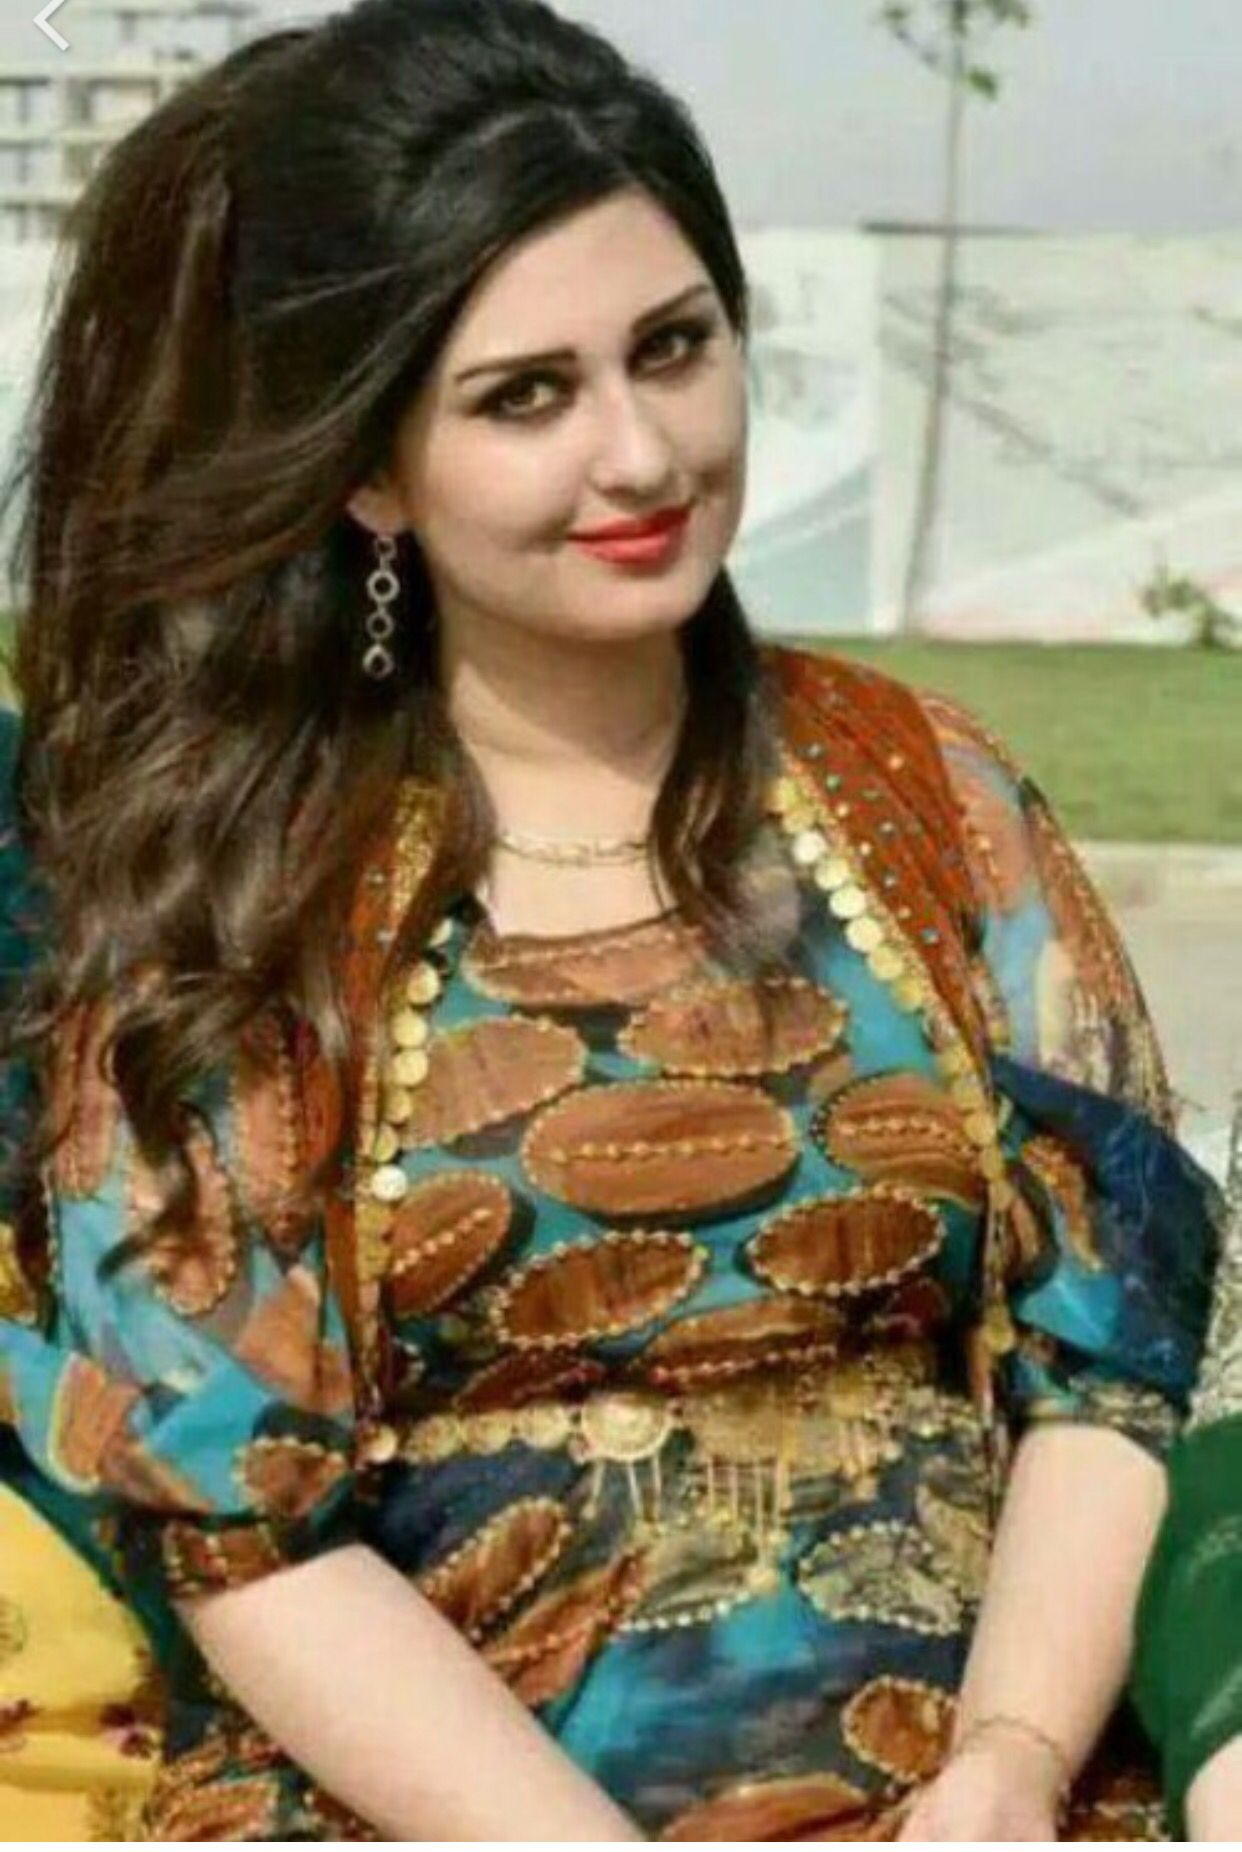 Pin von ٱژوان رحمانی auf دختر کردستان (کچی کوردستان) | Pinterest ...